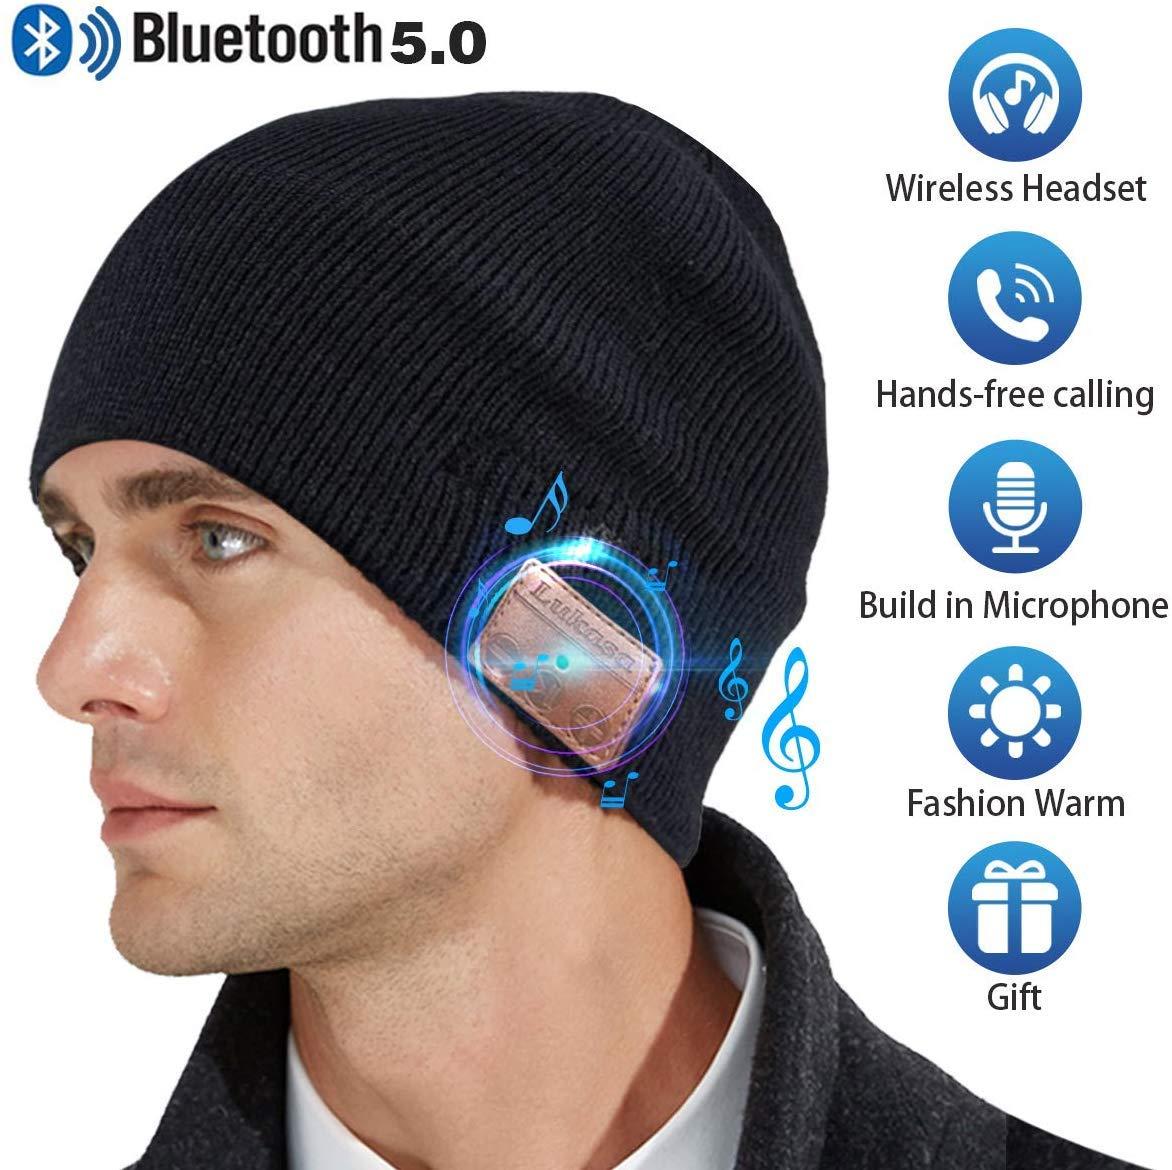 Unisex Bluetooth Beanie Music Hat Winter Running Knit Cap Headphones V5.0 Built-in Stereo Speaker Unique Christmas Tech Gifts for Women/Girlfriend/Men/Teen Girls/Stocking Stuffers Birthday Gift